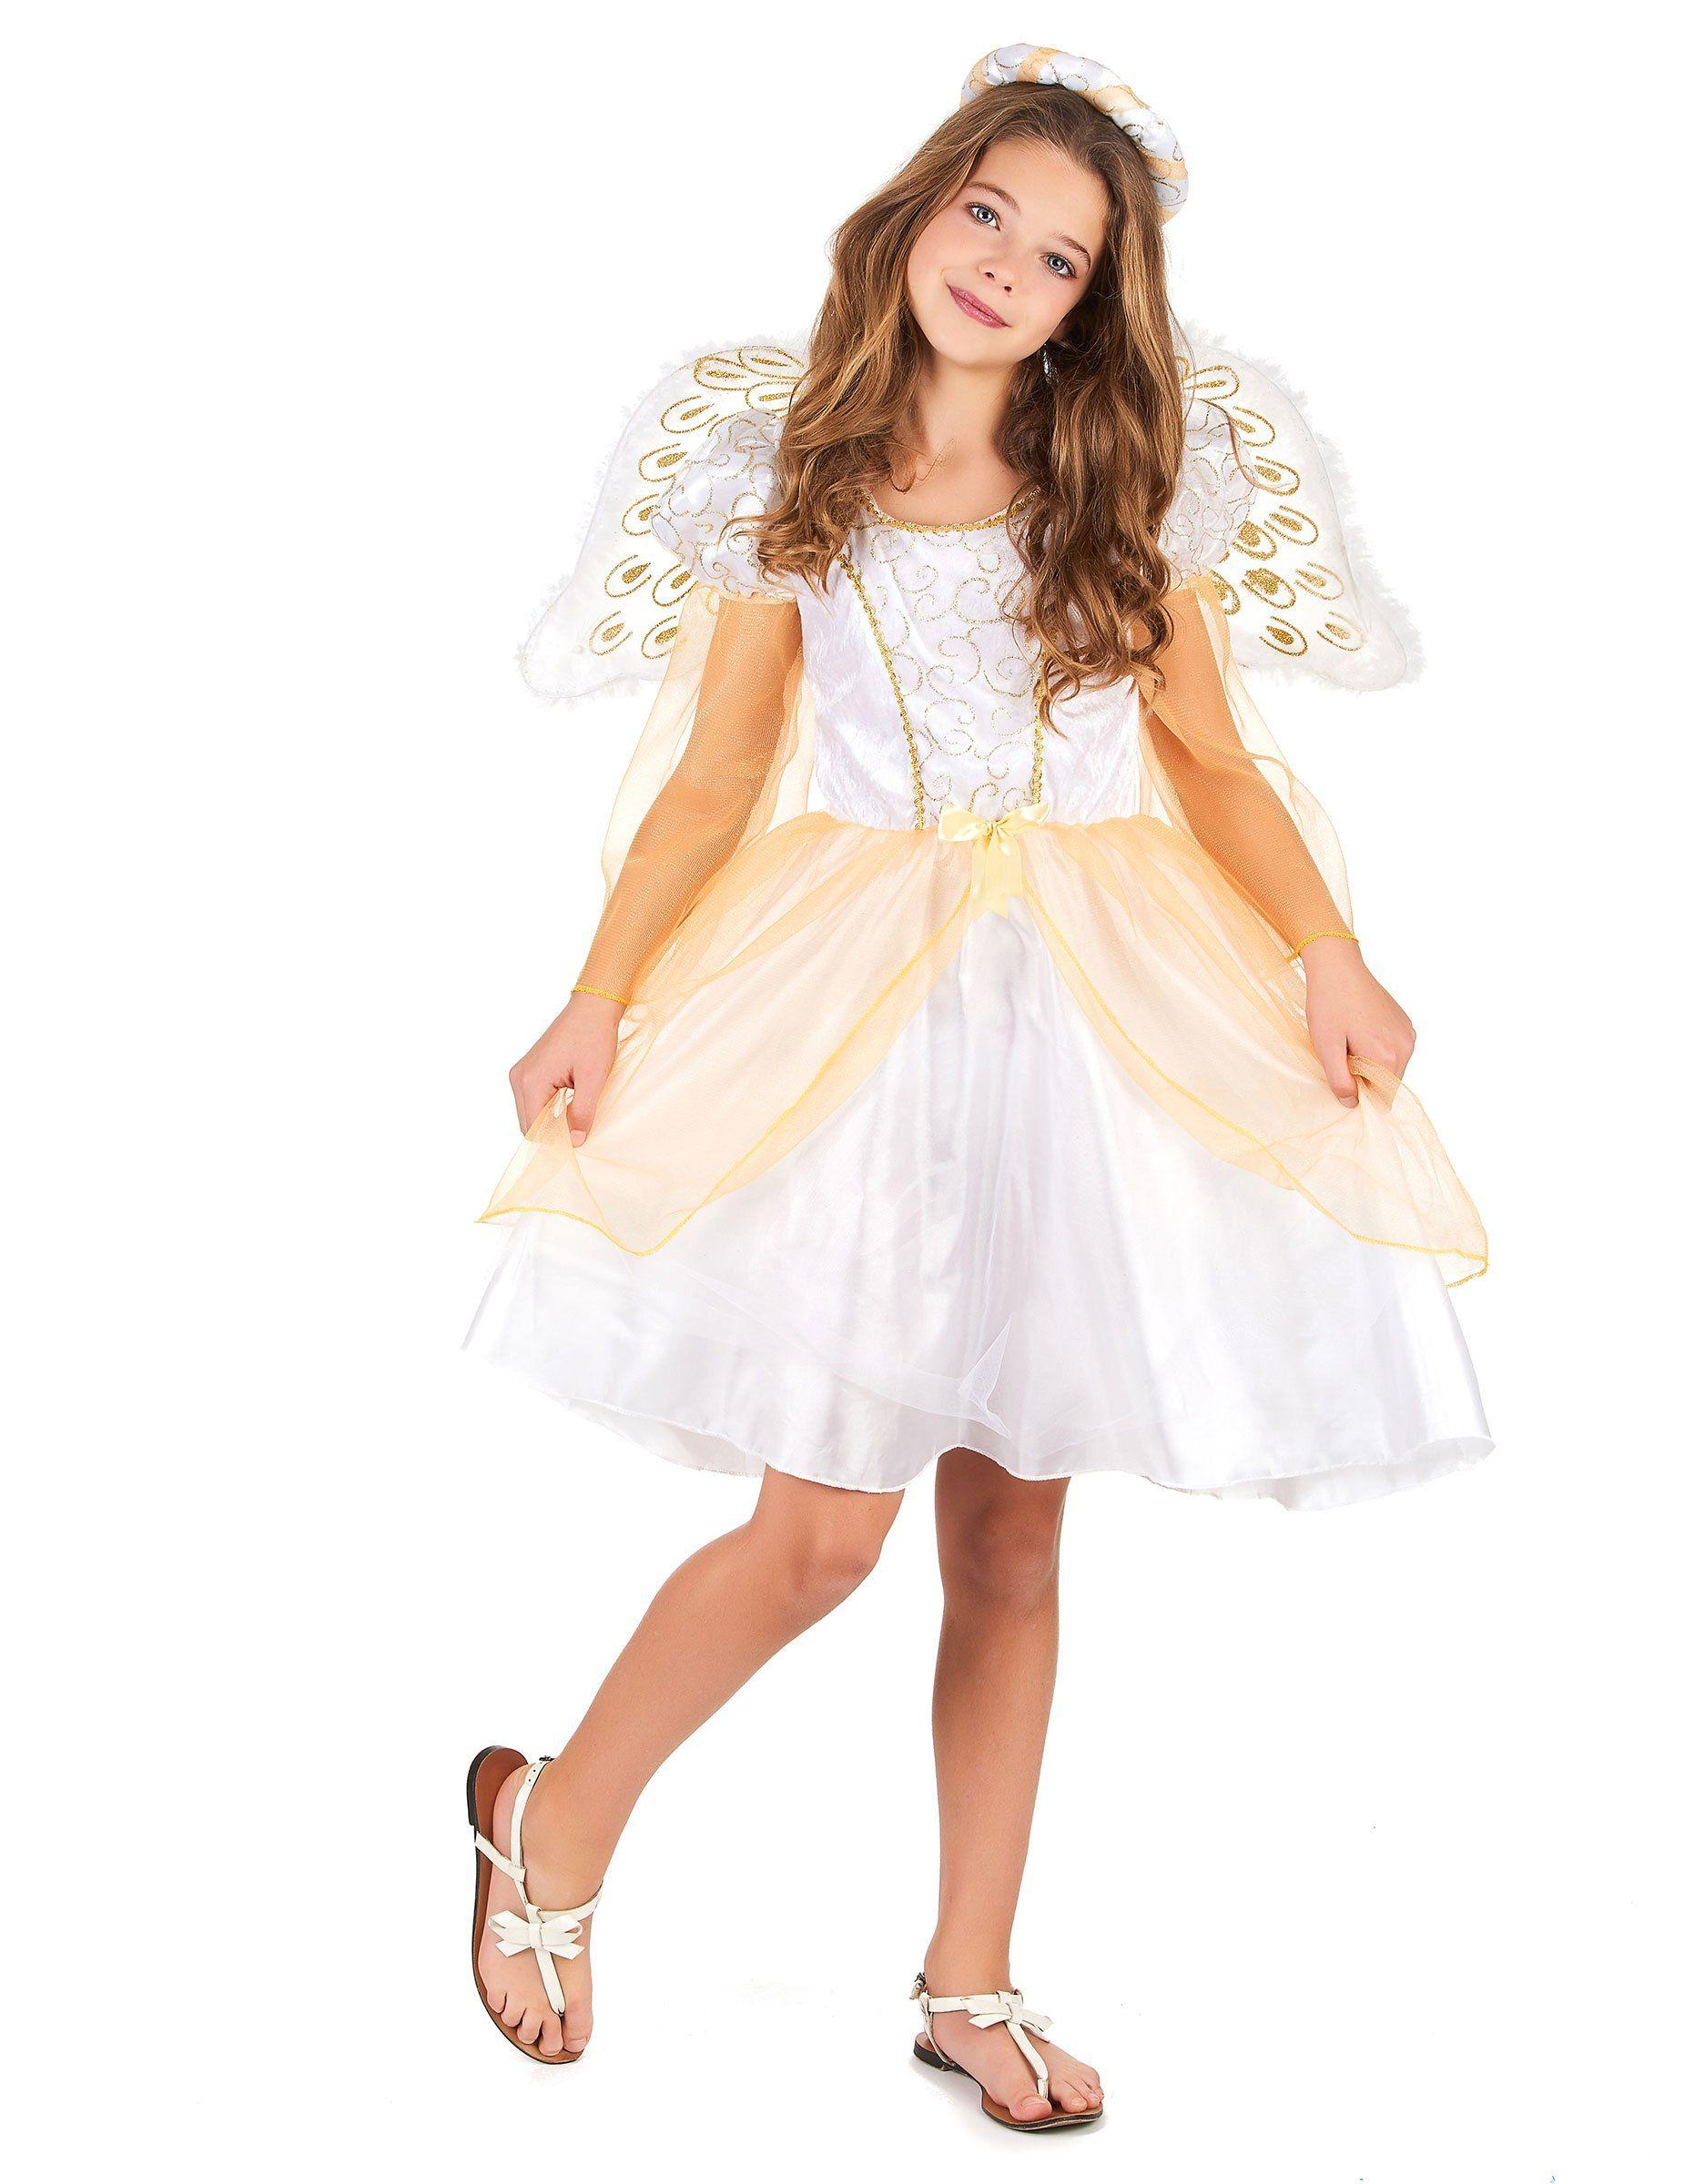 7a2d3bafa Disfraz de ángel para niña   ANGELES   Girls angel costume ...